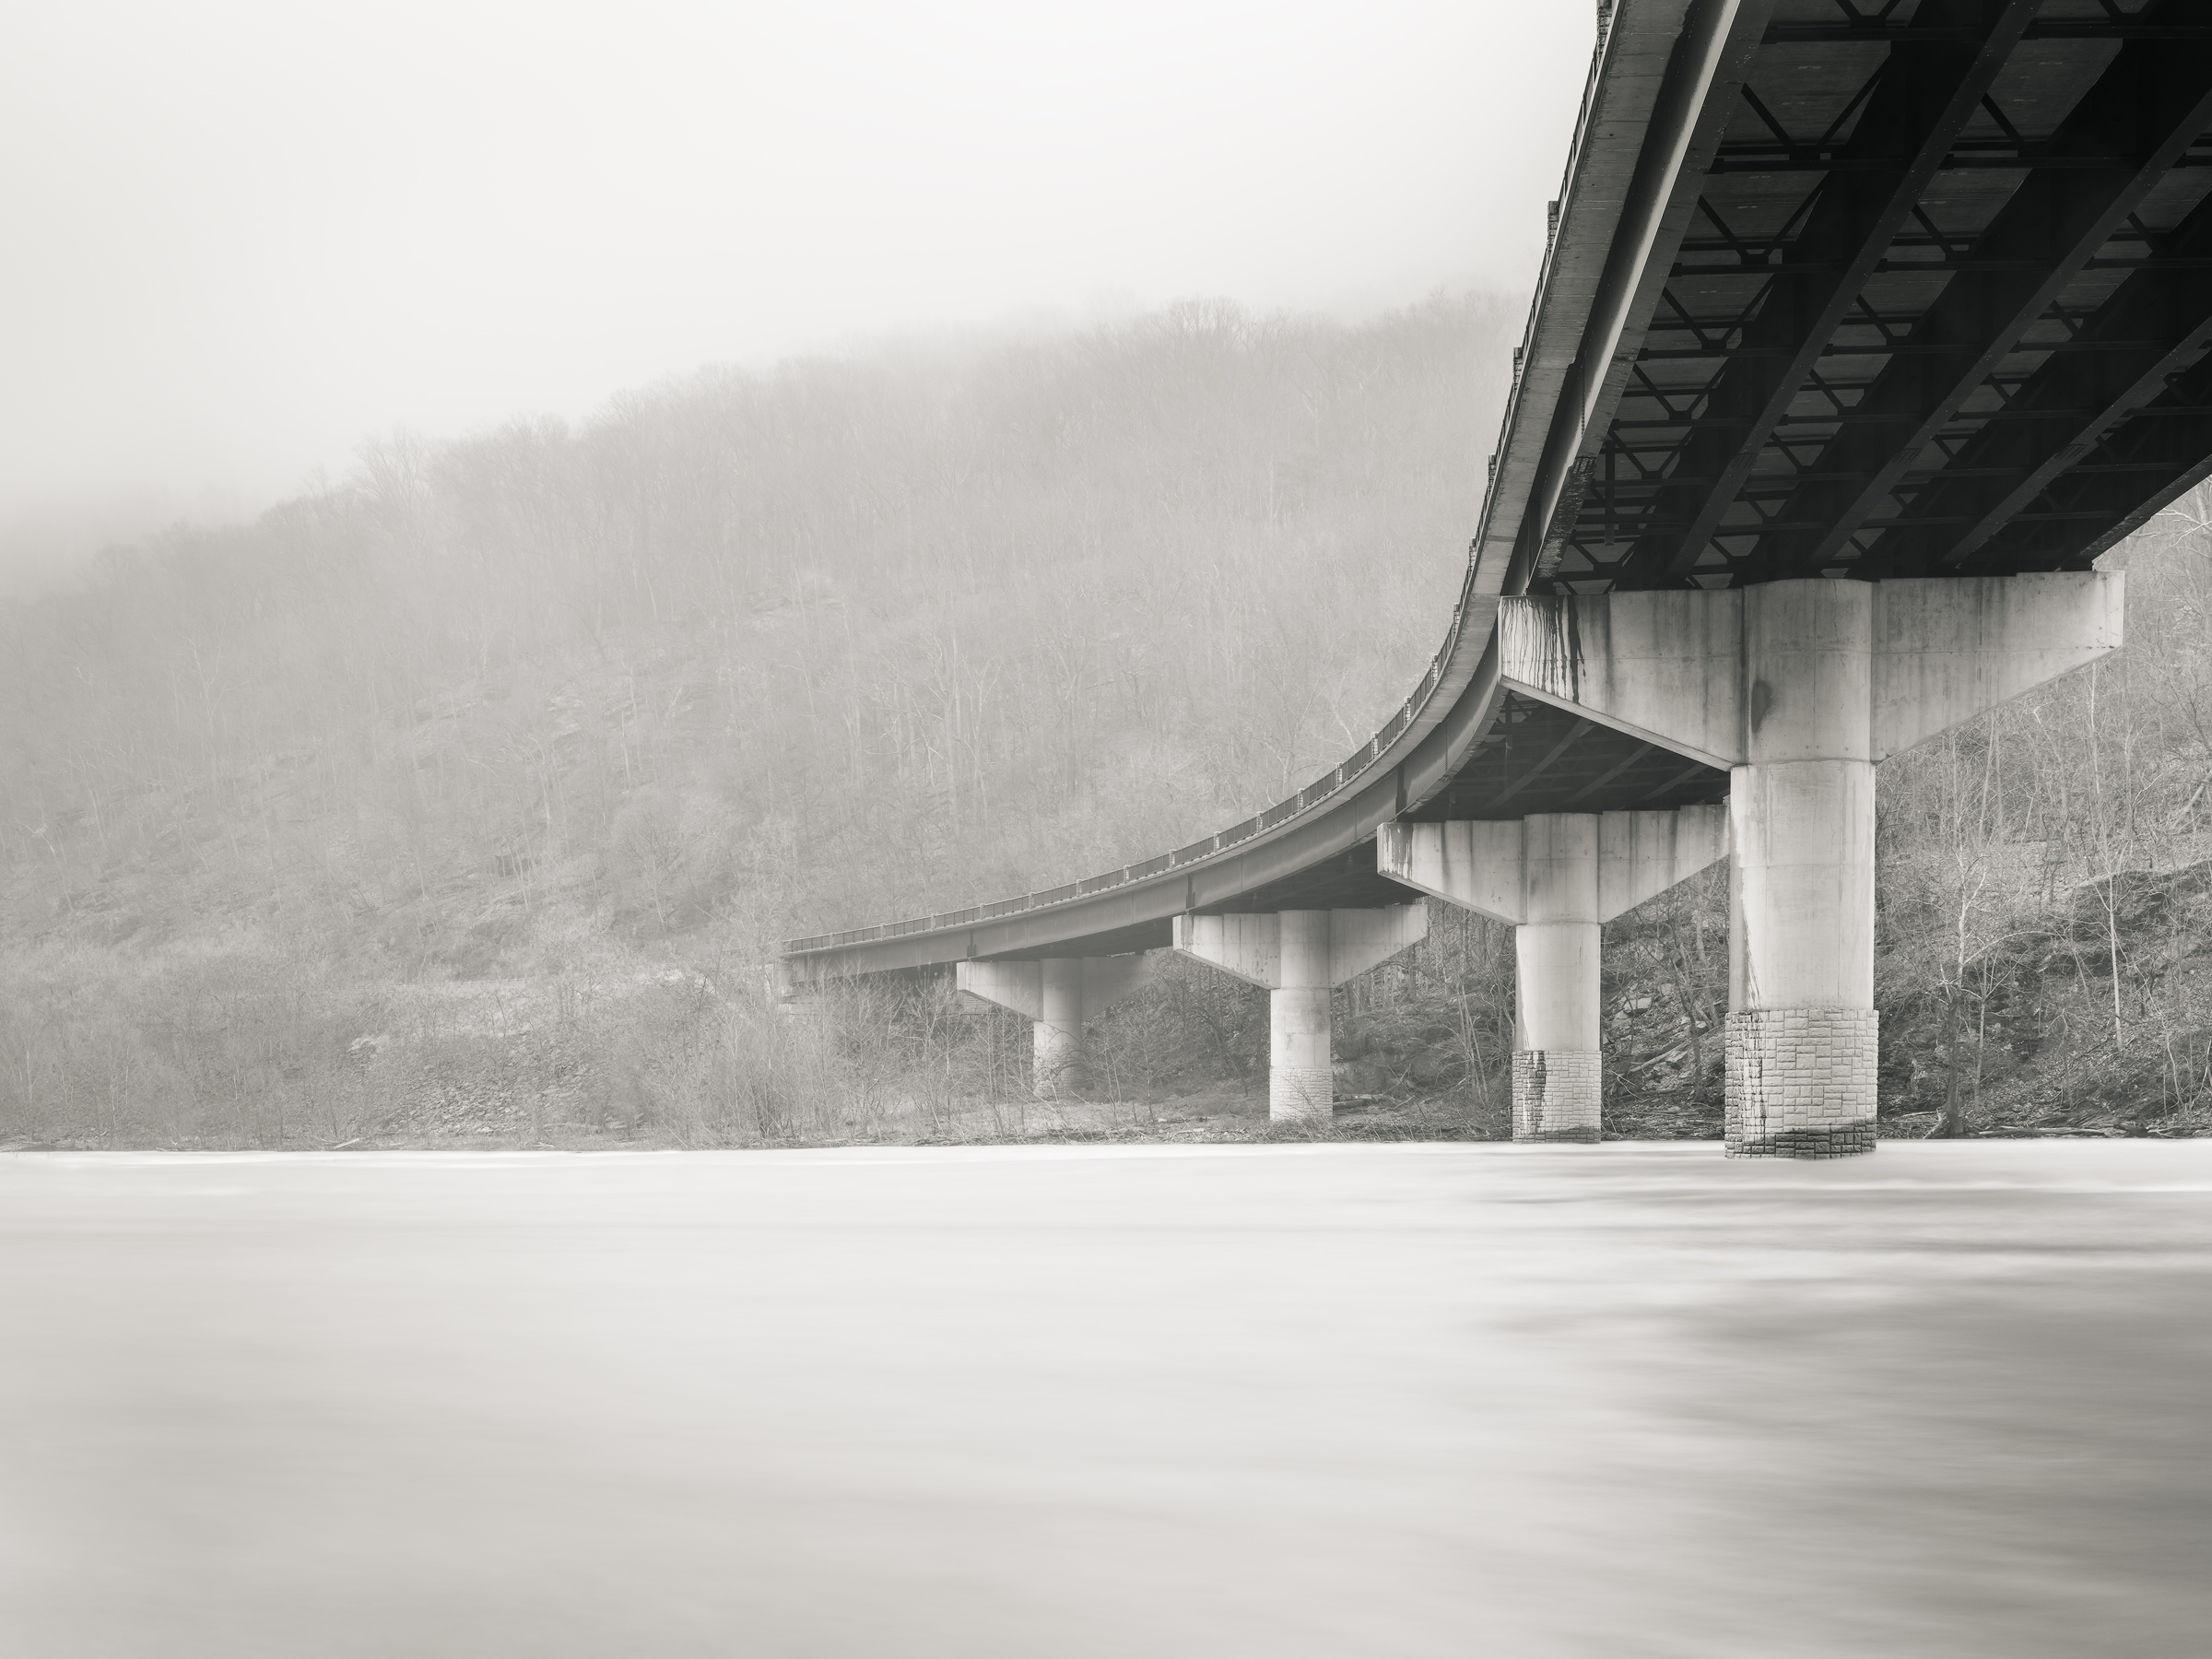 The Bridge No. 2, Harpers Ferry WV - Fuji GFX50s and a Fujinon GF32-64mm f4 R WR   ISO 100 at f11 for 120 seconds.